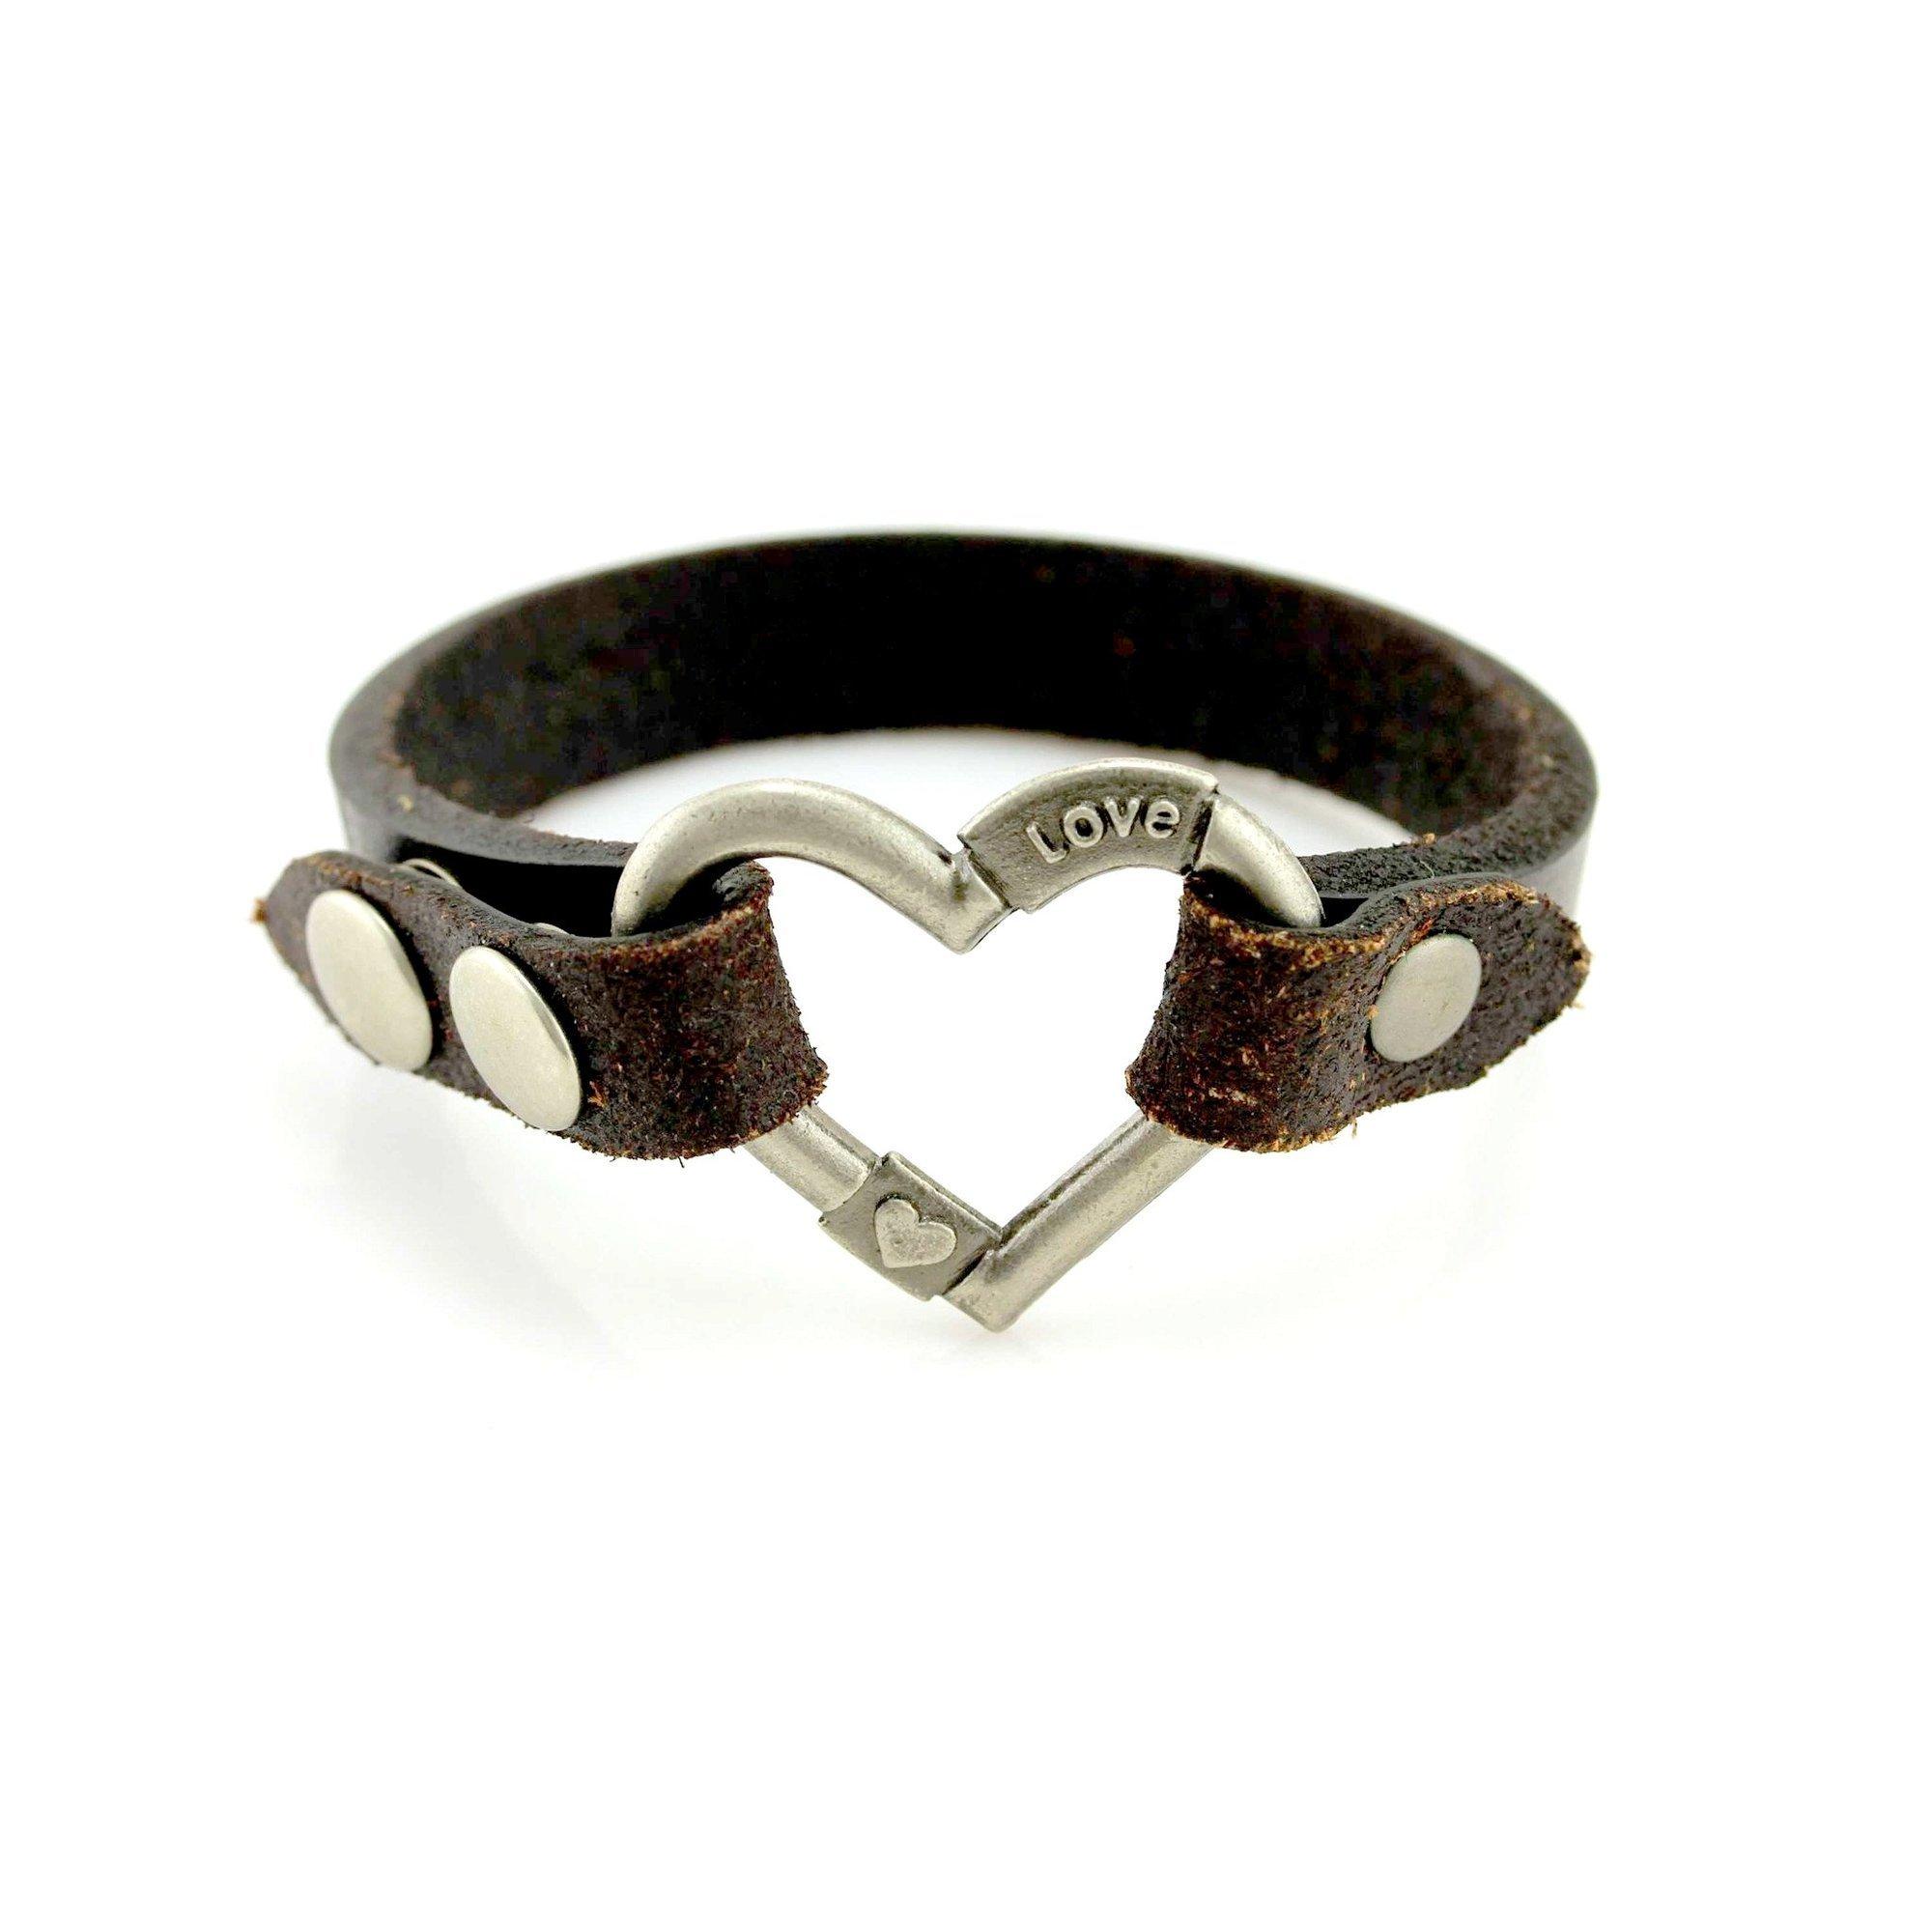 Balla Mother Daughter Bracelet, Heart Bracelet, Leather Bracelet with Silver Love You Bracelet by